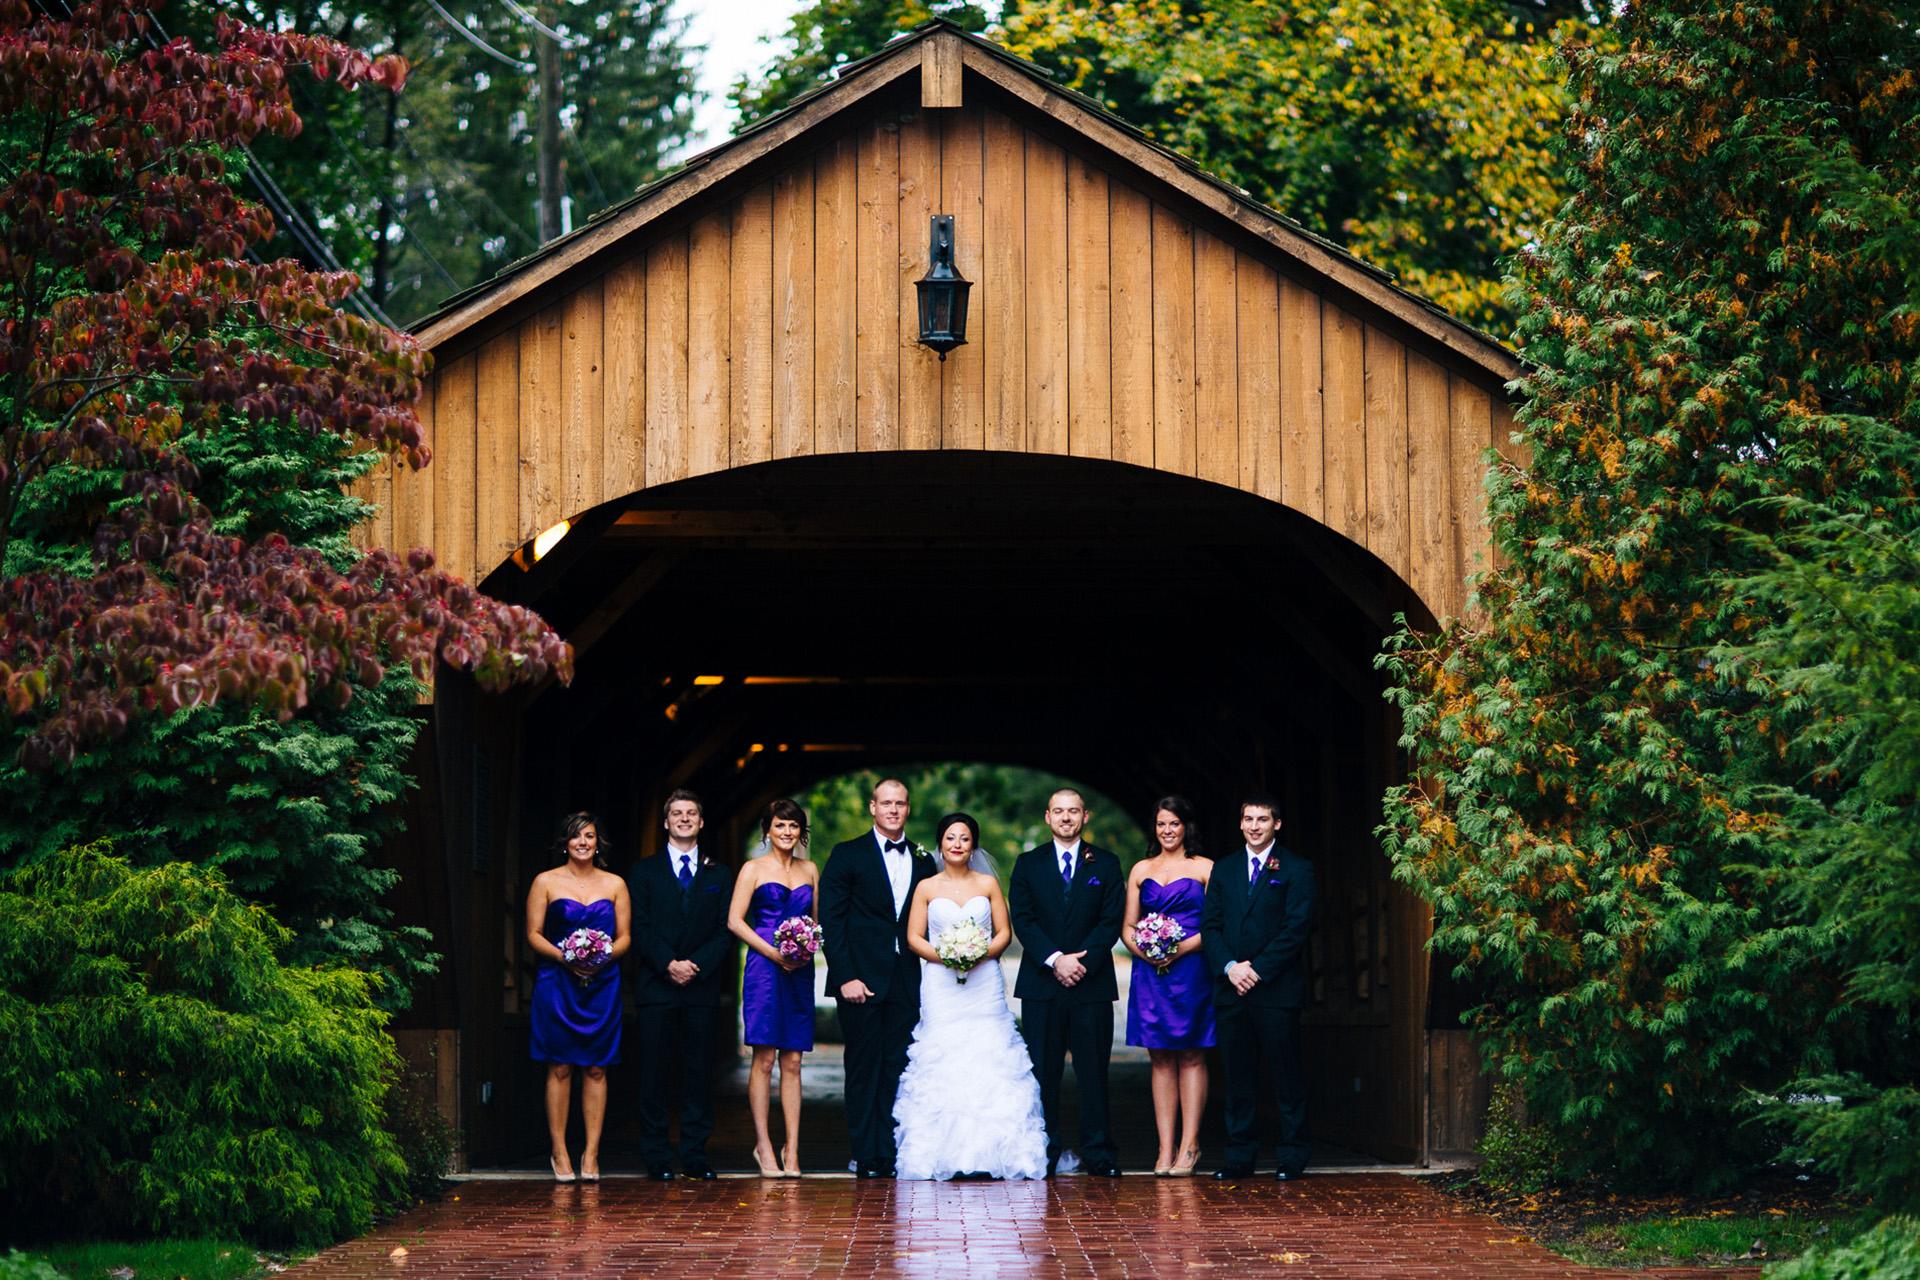 Cleveland Wedding Photographer St Christopher's Church Red Tail Golf Club 14.jpg